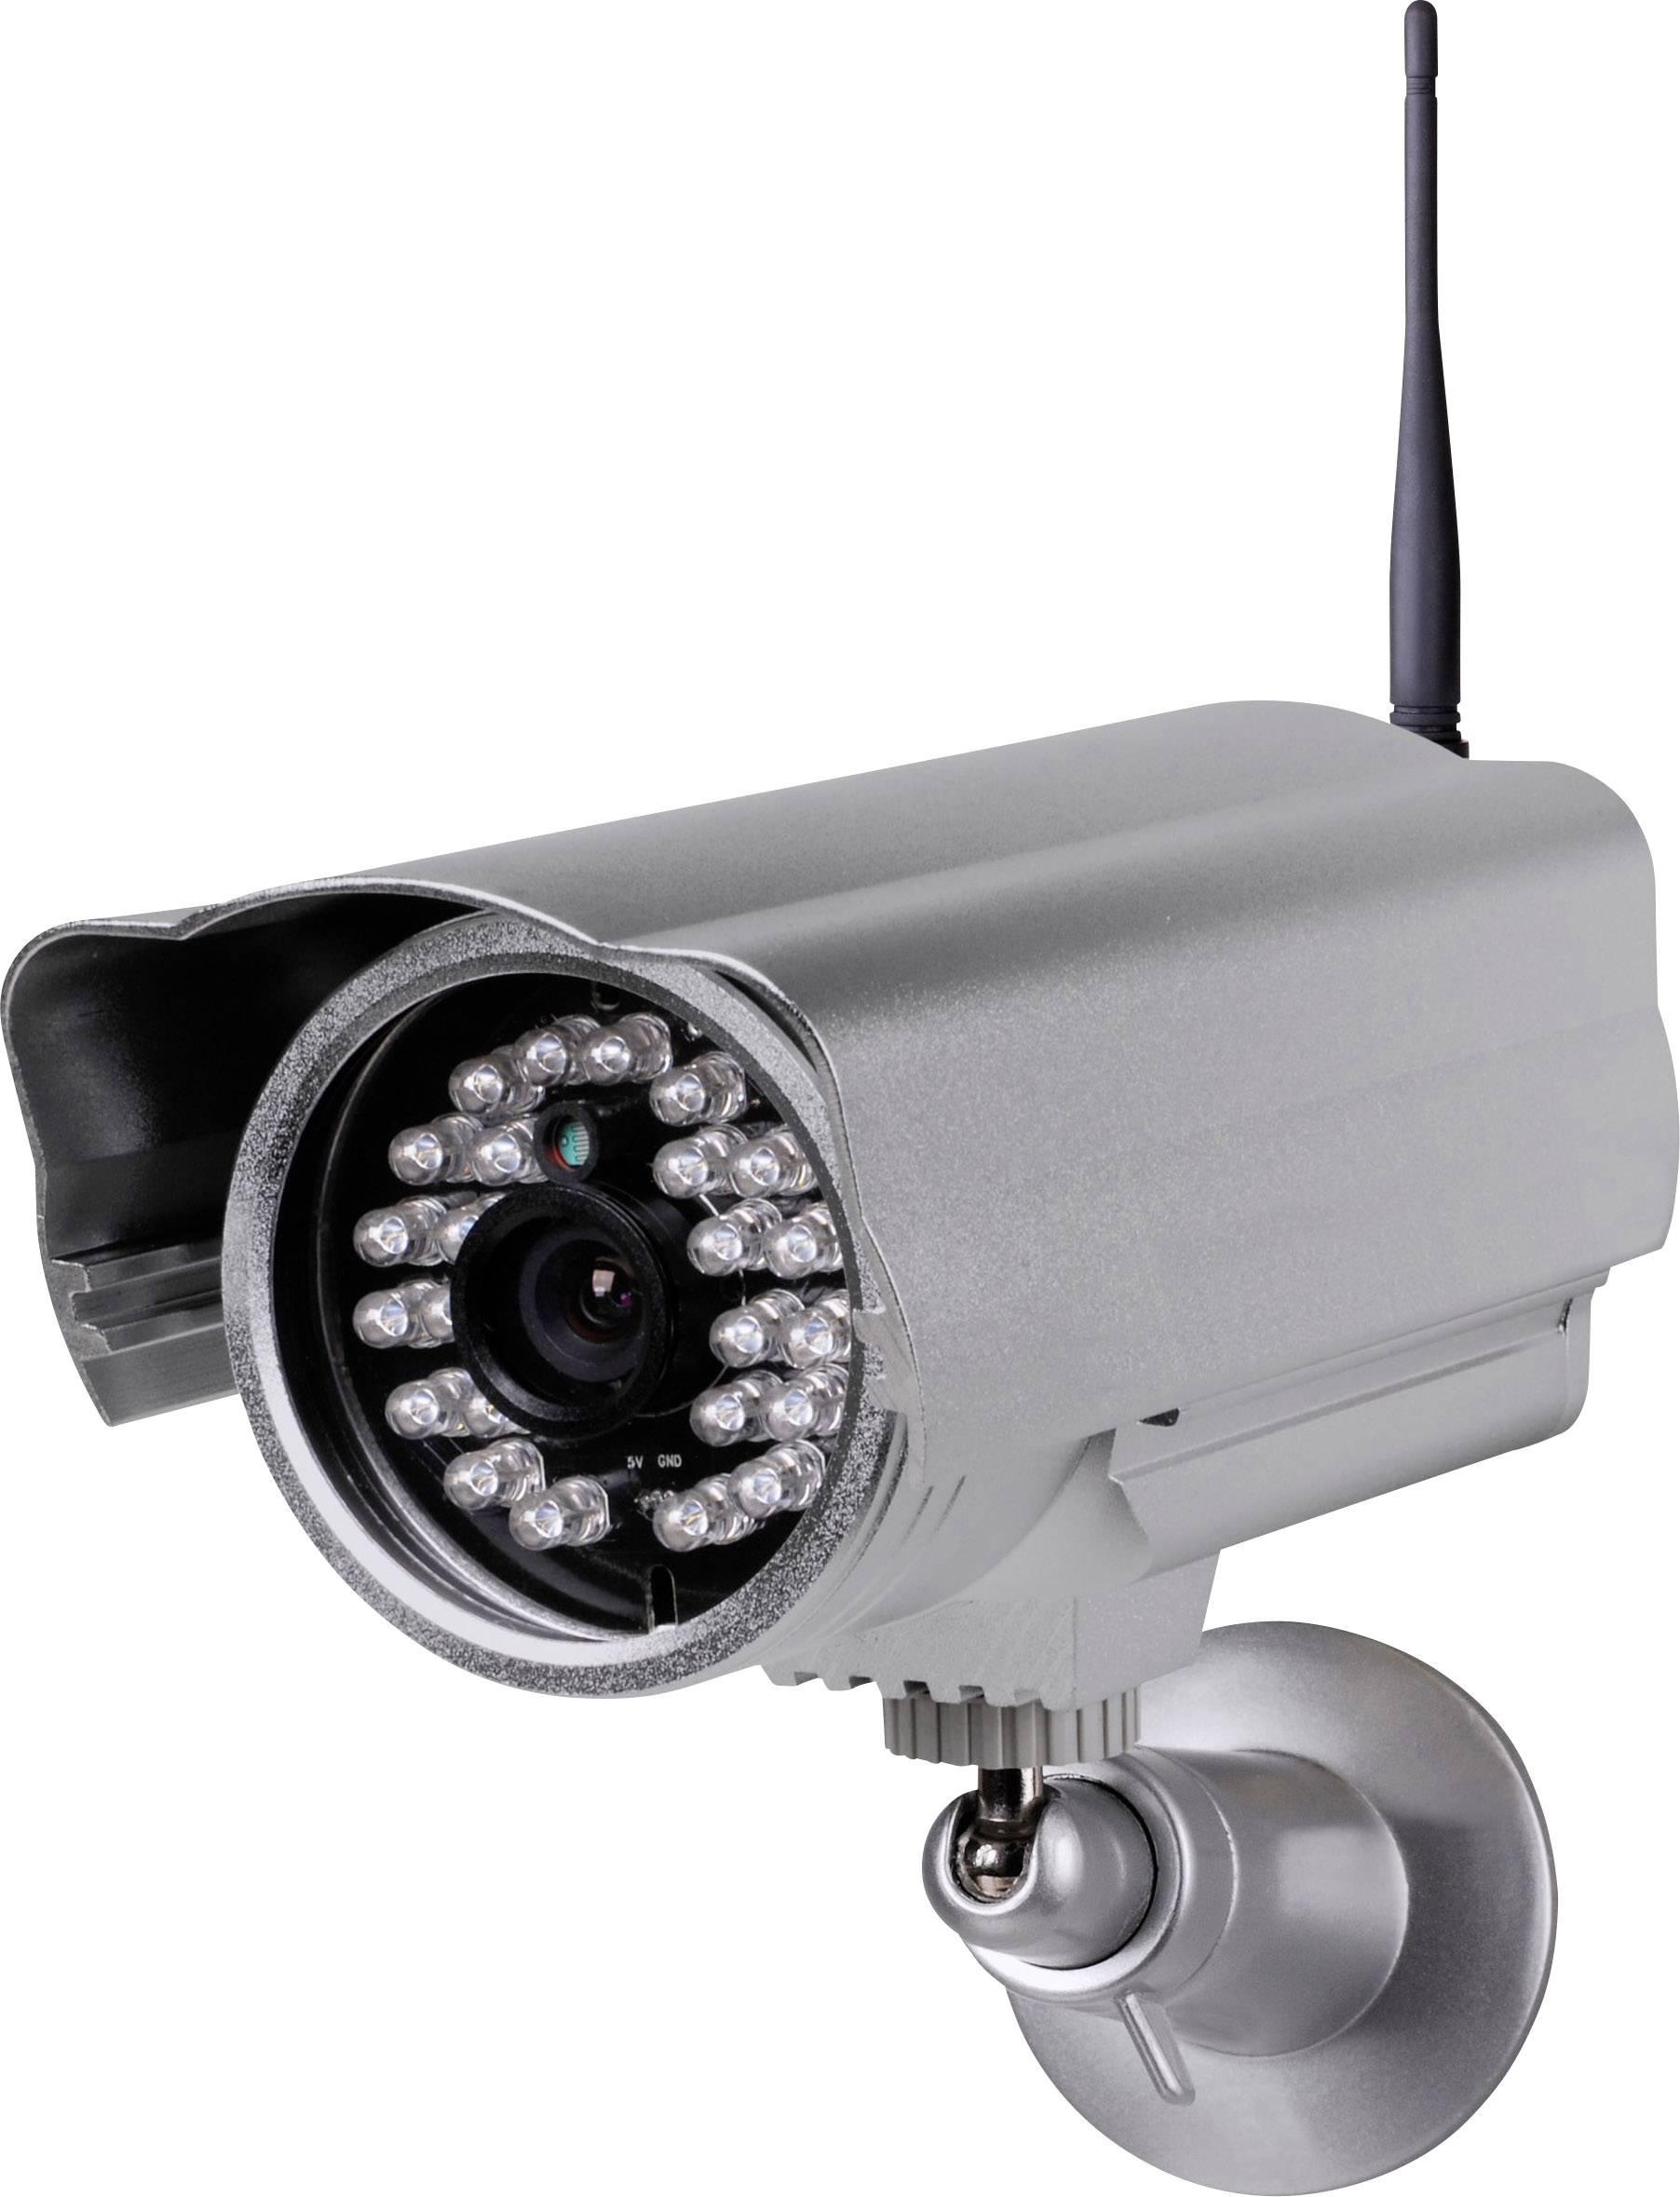 Smartwares C903IP.2 SW WLAN IP Videocamera di sorveglianza 640 x 480 Pixel